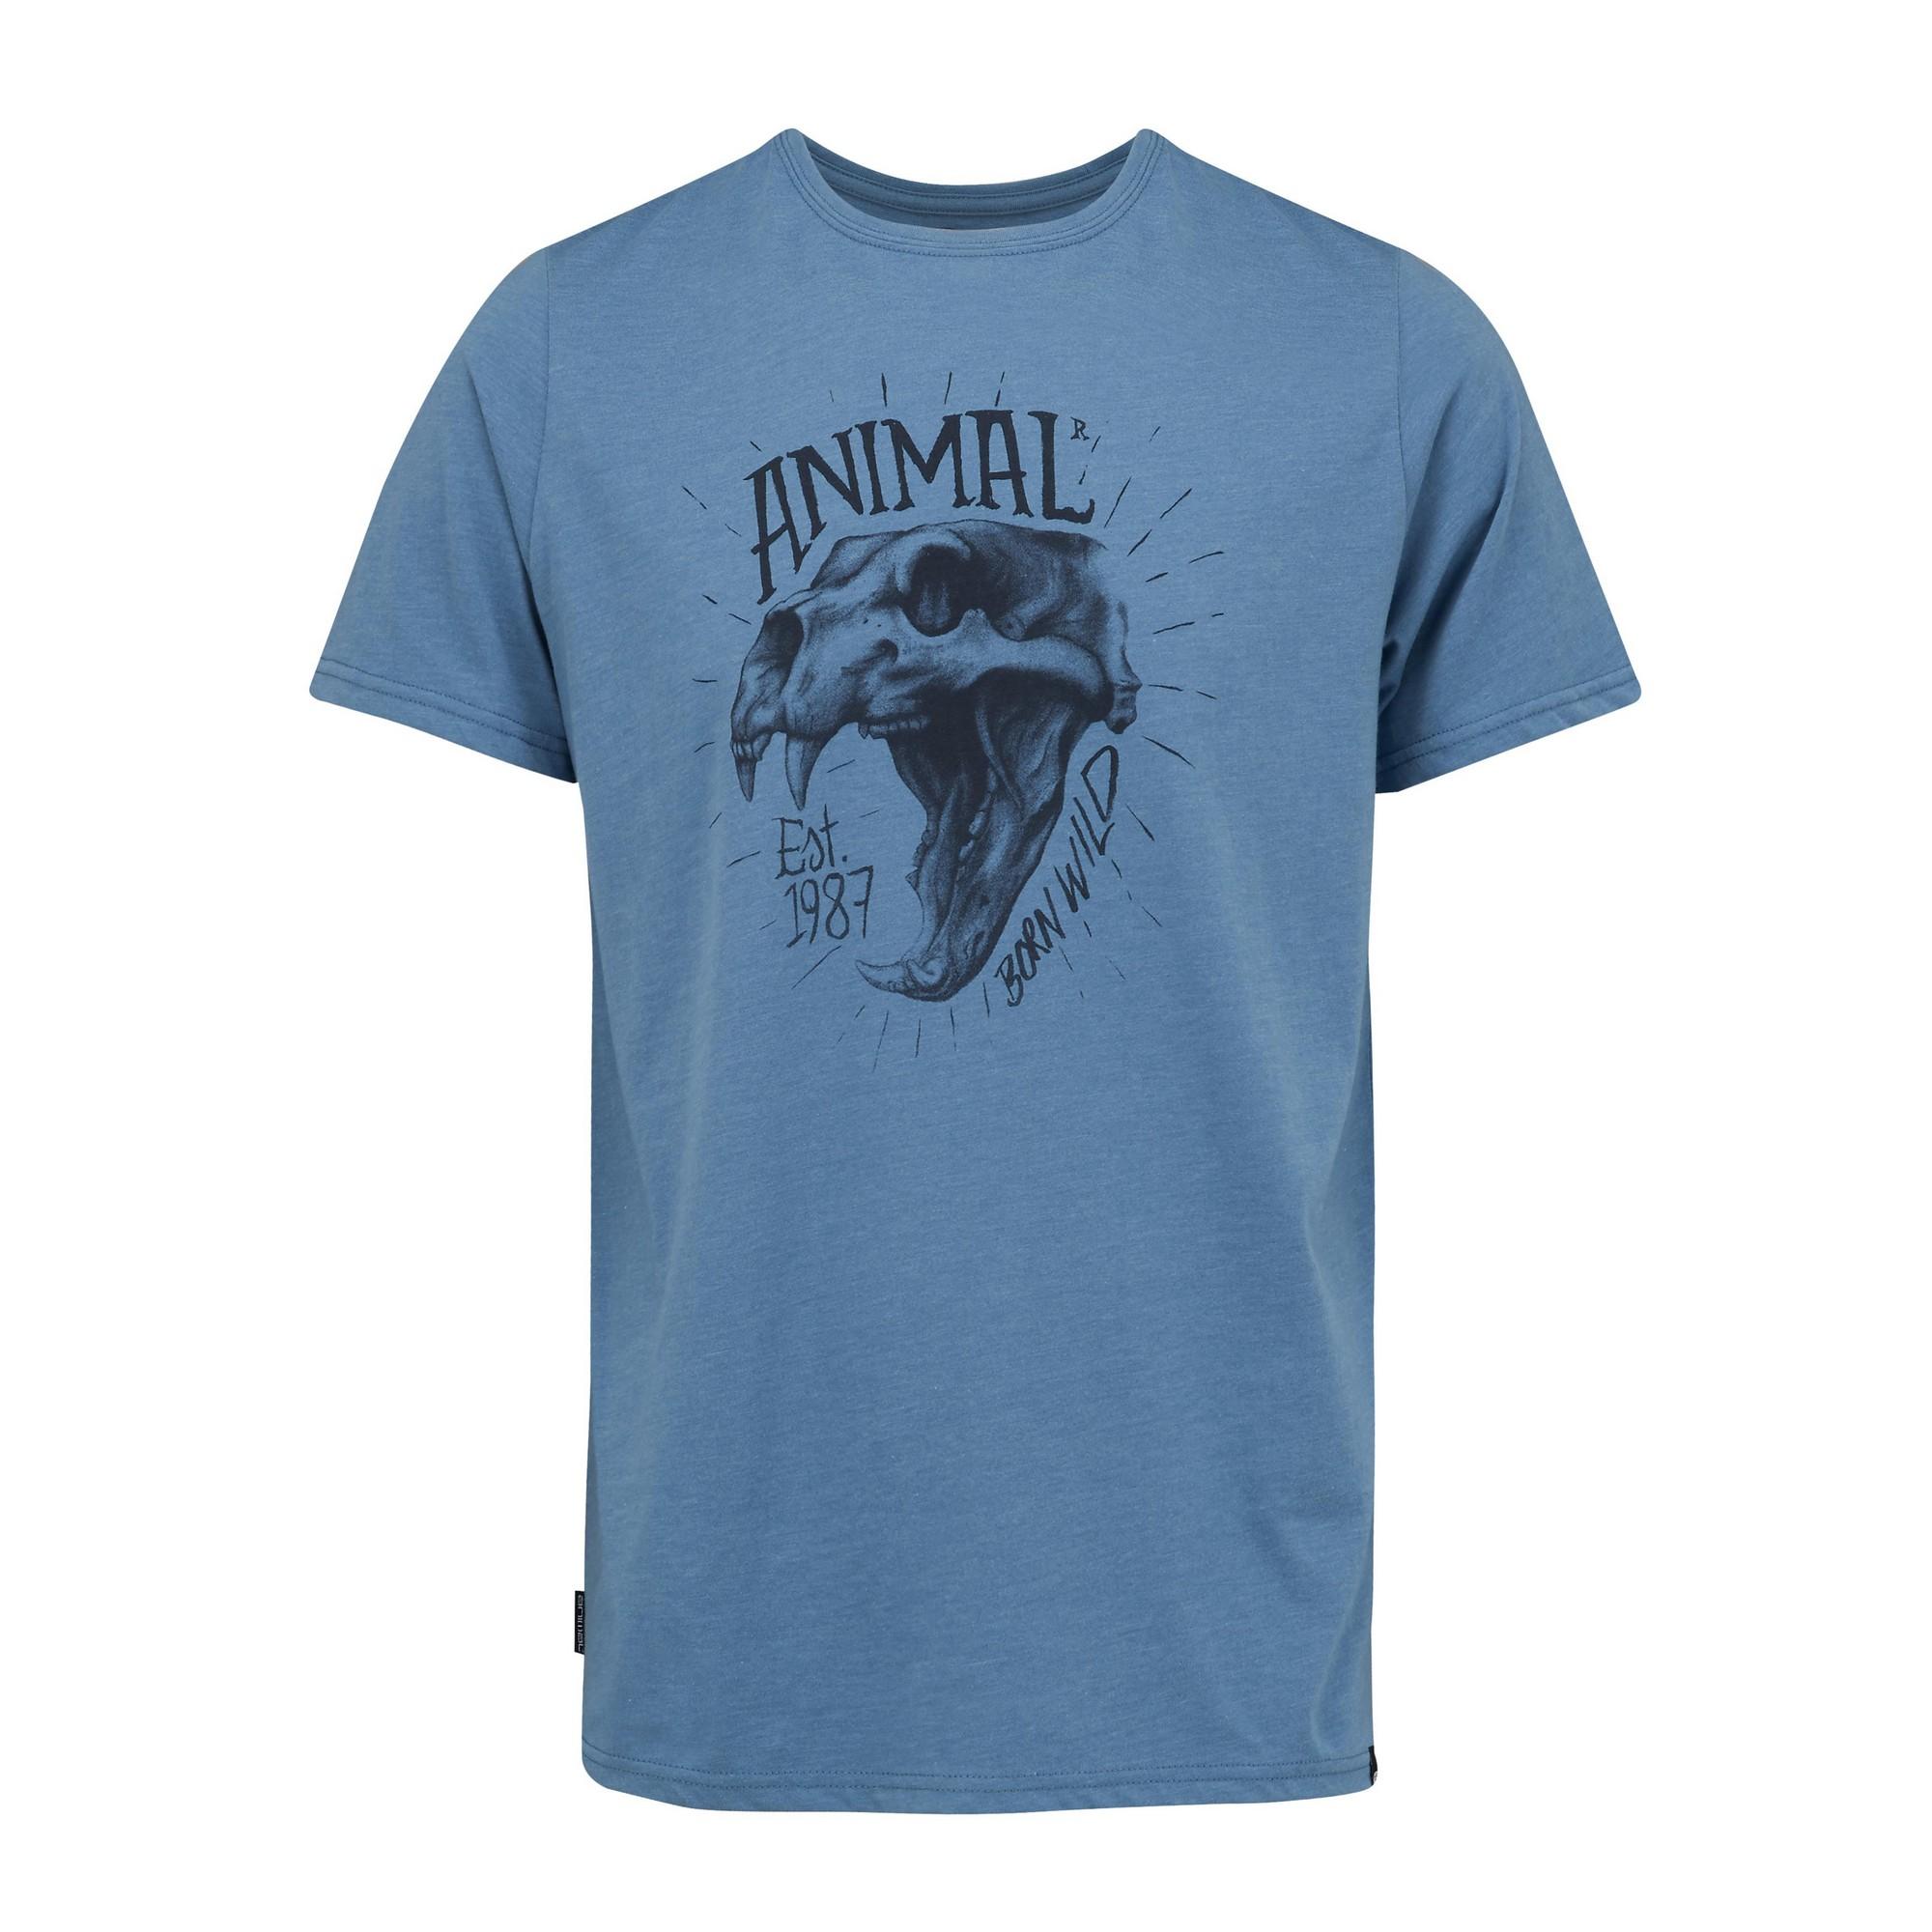 Animal-Camiseta-impresion-Calavera-animal-salvaje-hombre-caballero